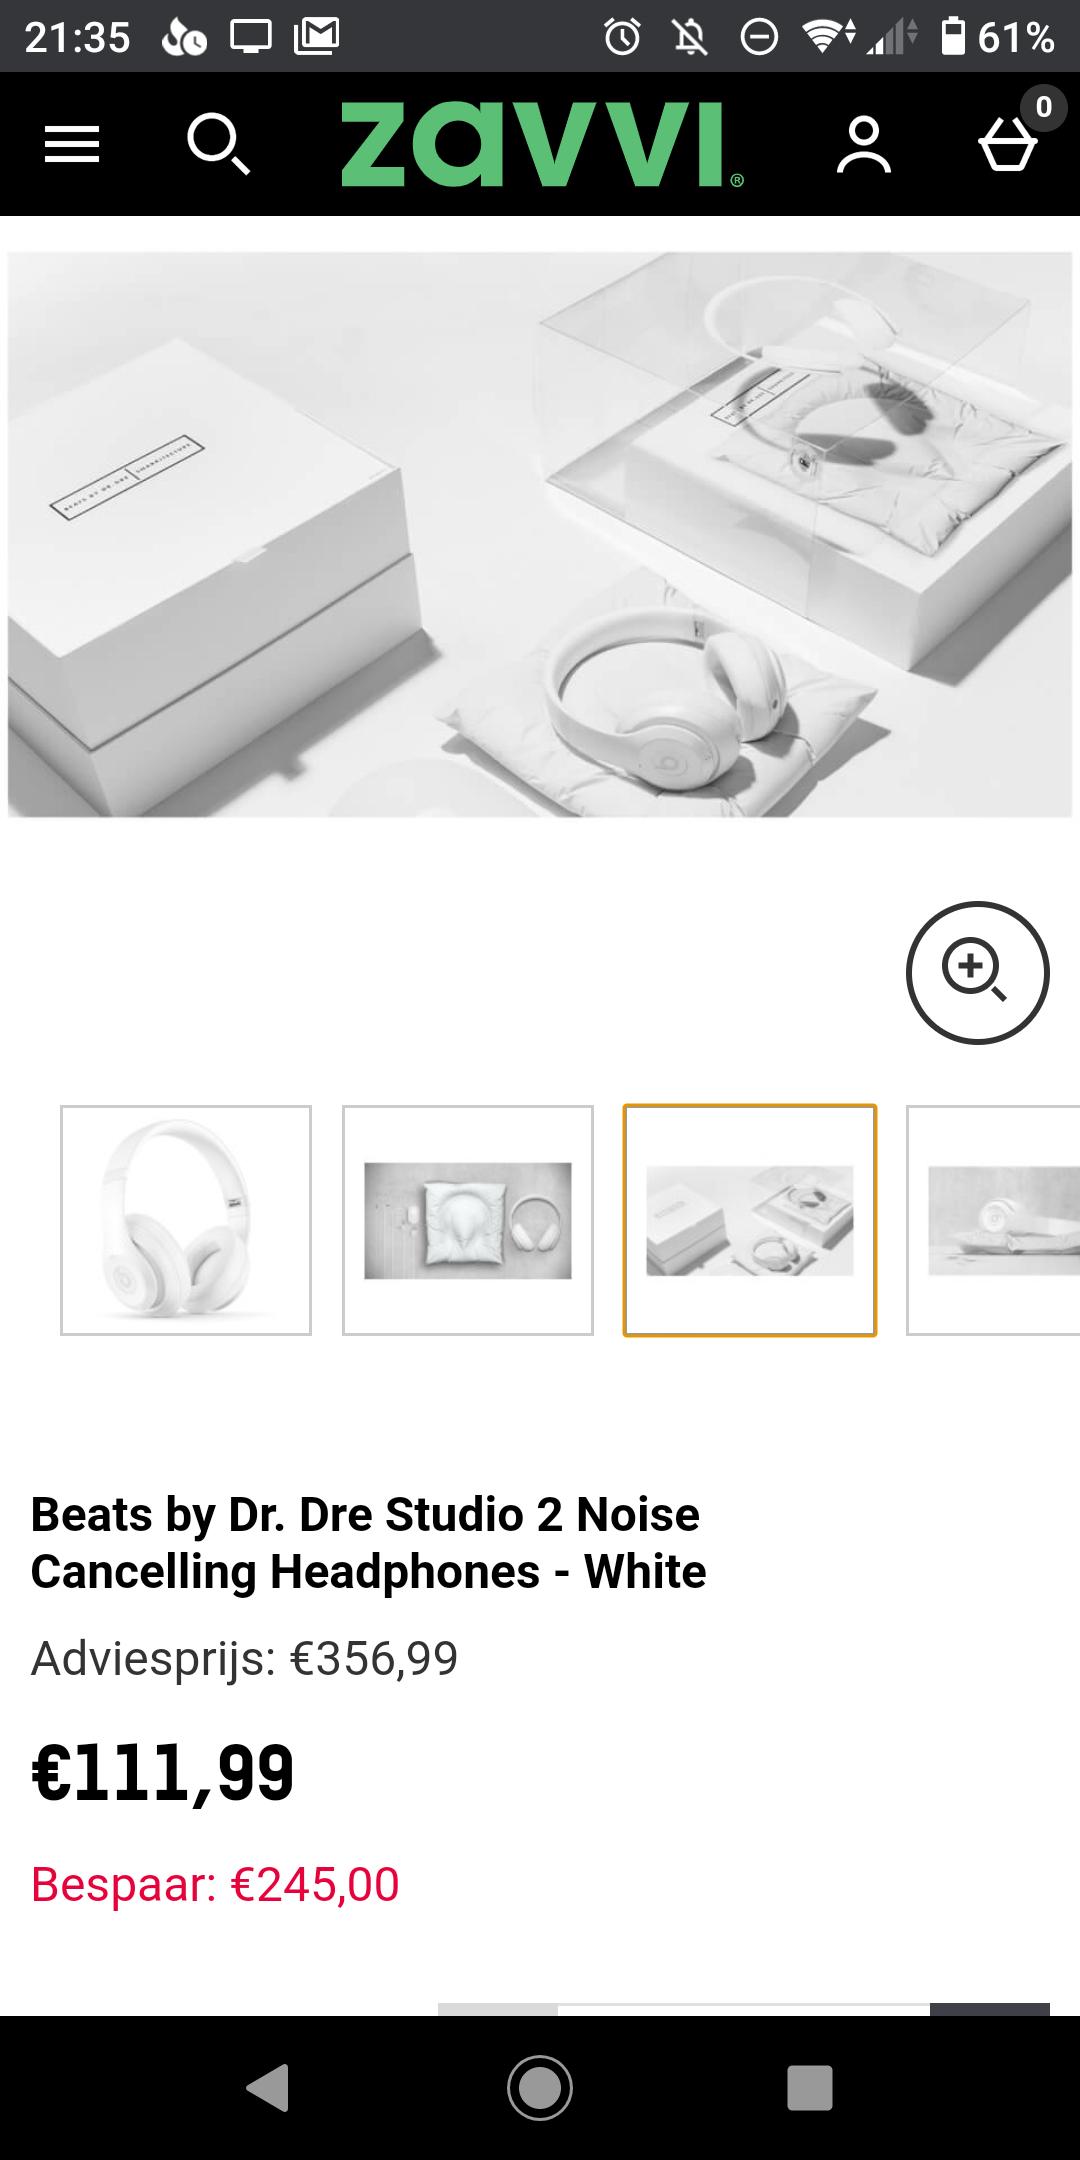 Beats by Dr. Dre Studio 2 Noise Cancelling Headphones - White